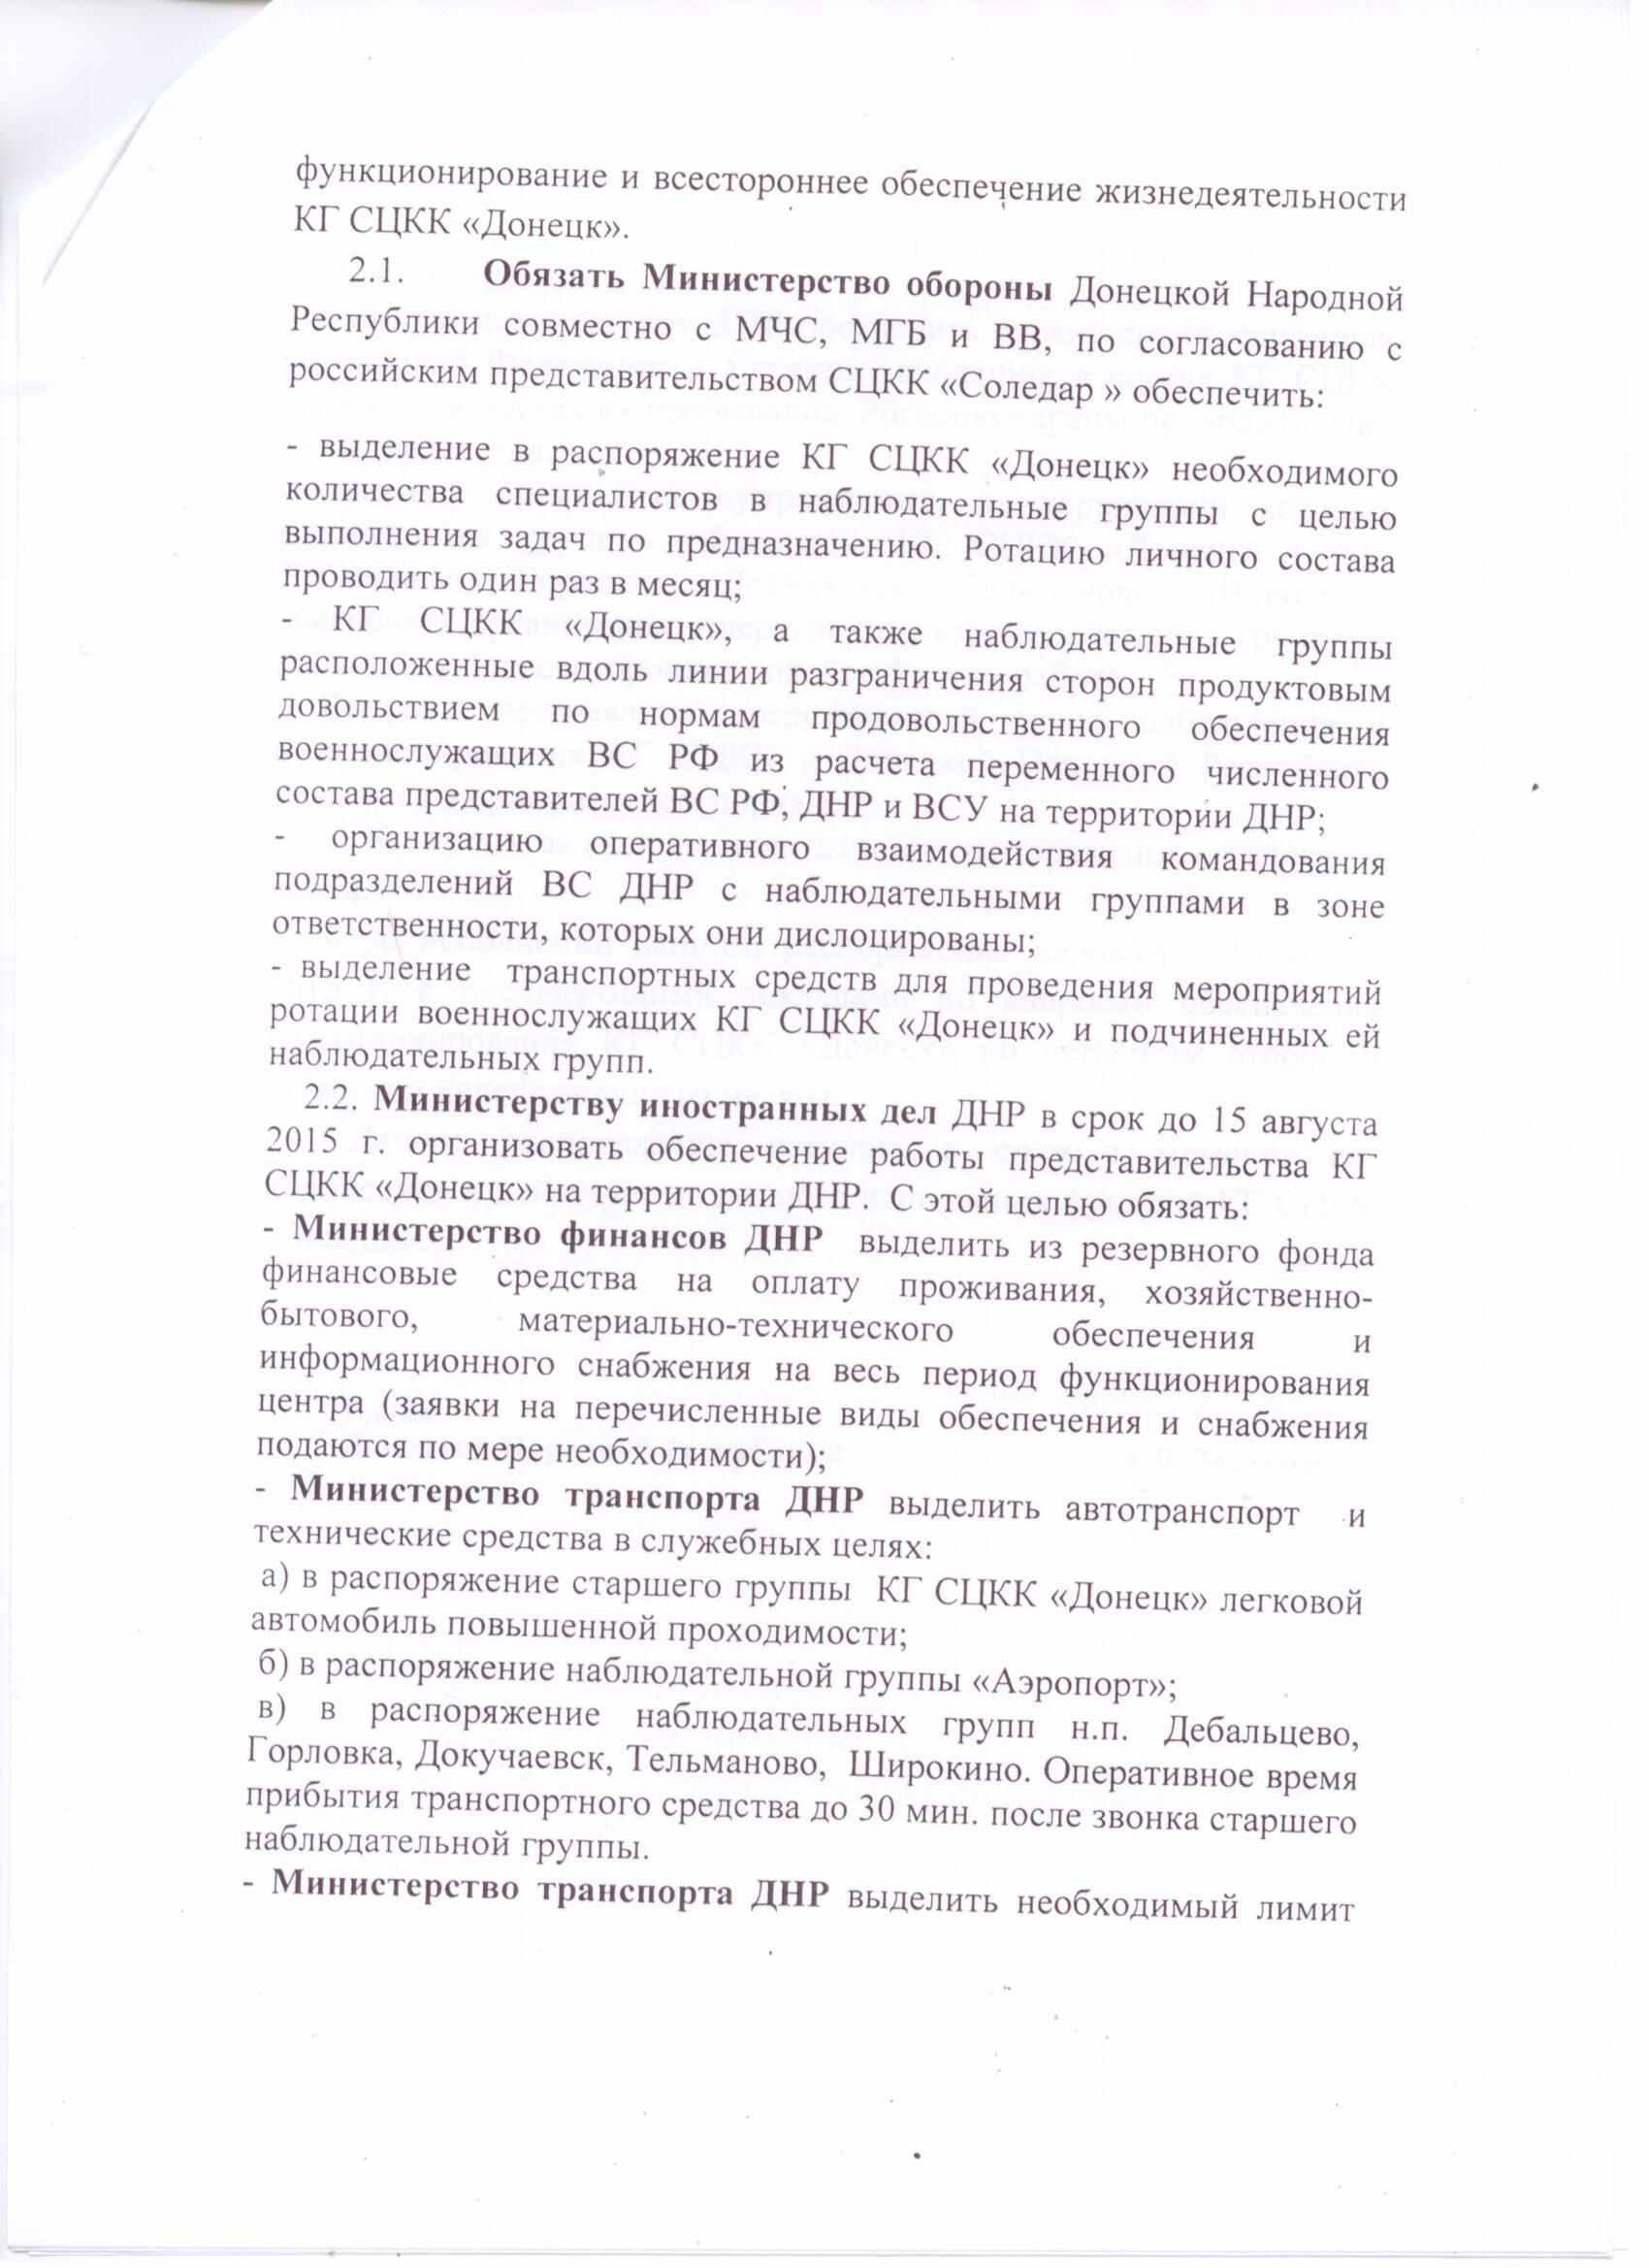 https://b0ltai.files.wordpress.com/2015/09/d0b7d0b0d185d0b0d180d0bed0b21-001.jpg